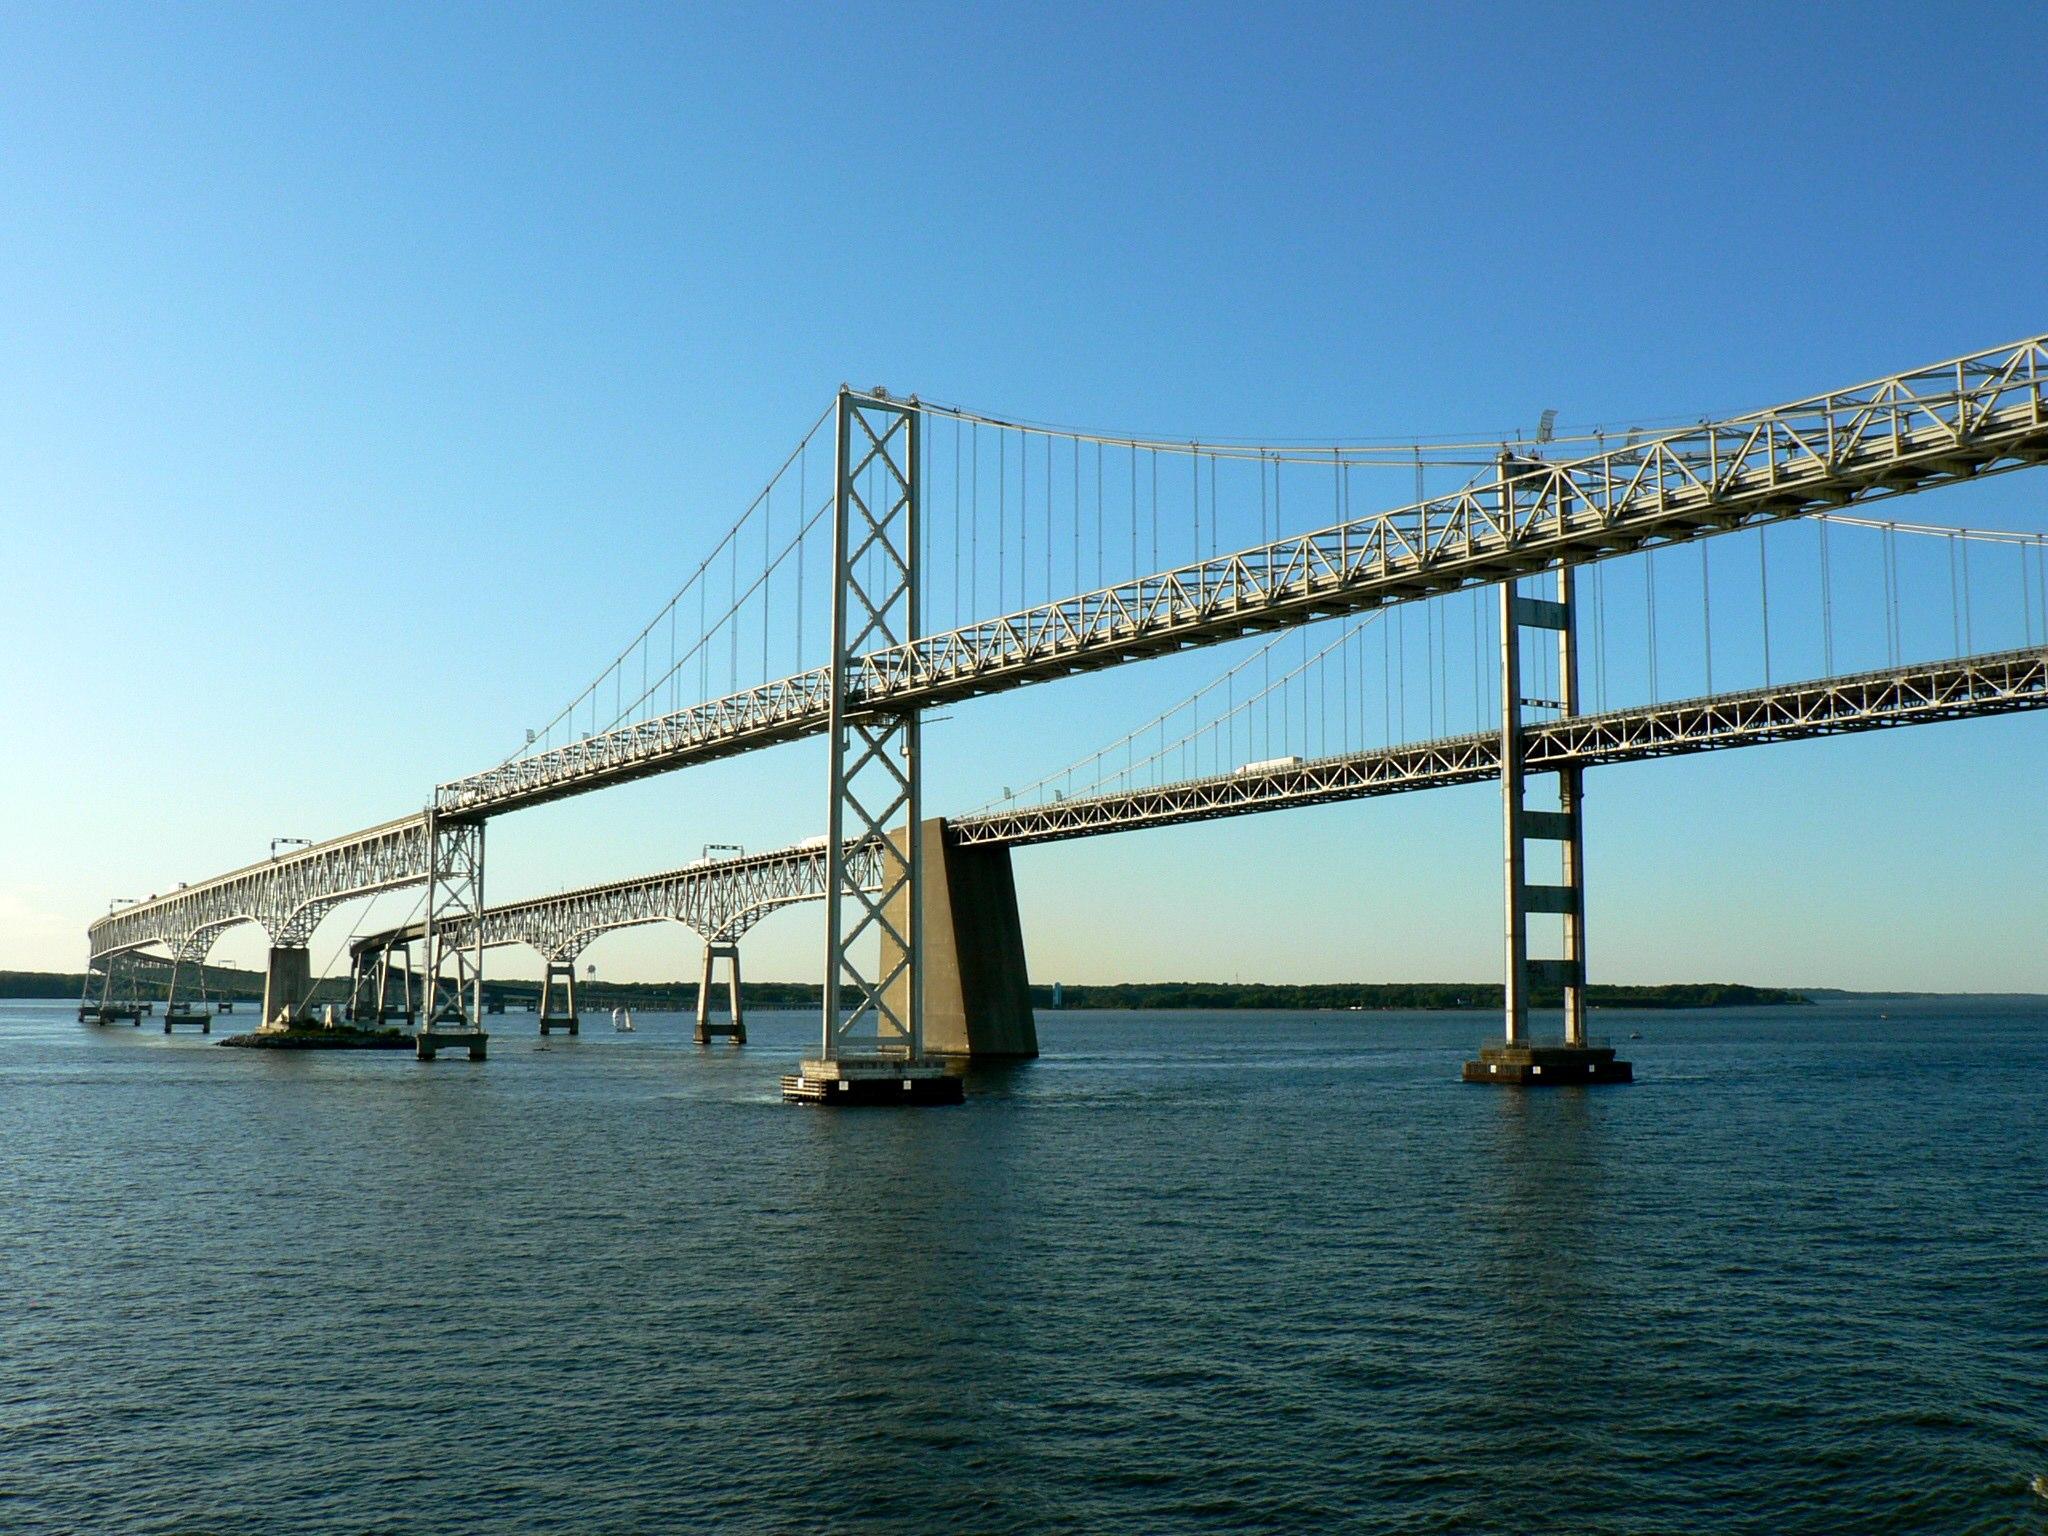 Chesapeake bay bridge crash july 2016 the best bridge 2017 for Bay bridge run 2016